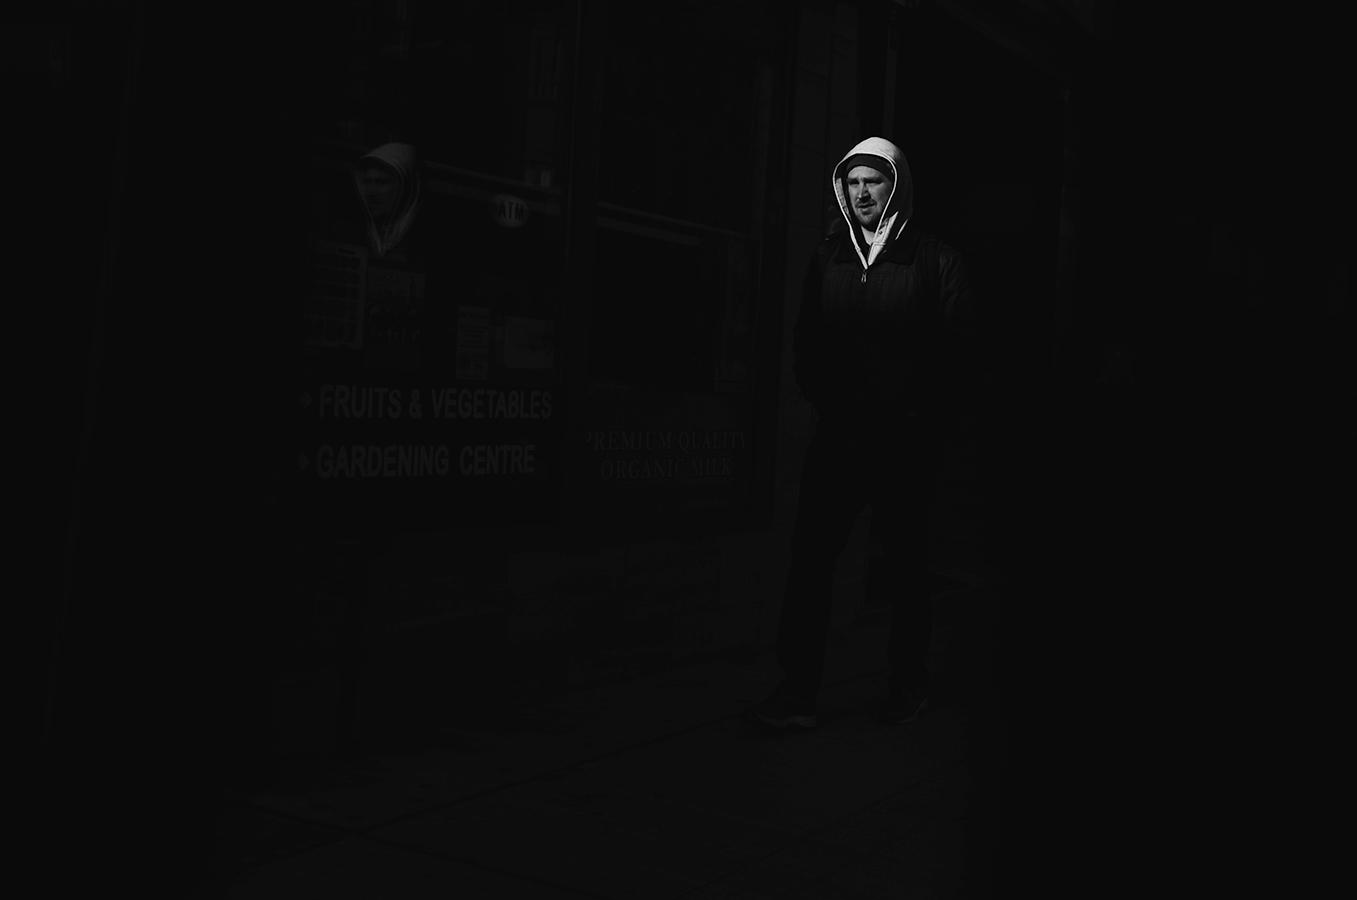 Spots of light along Bloor Street West, Toronto - Fuji X-T10 + XF 18mm f2.0